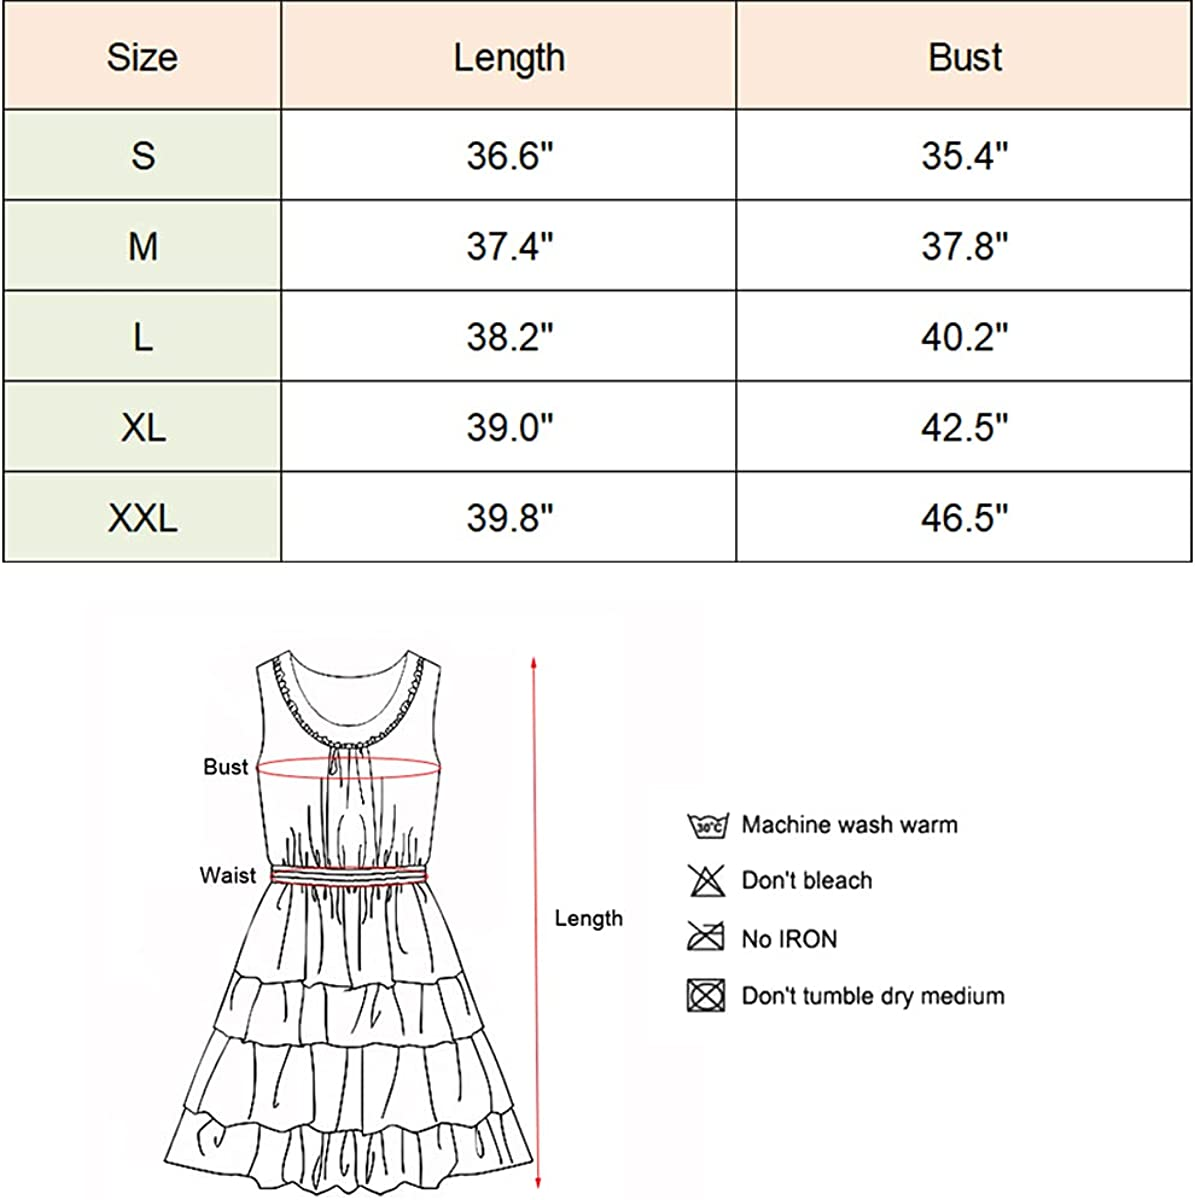 Hibluco Women Summer Swing Dress Casual Floral Knee Length Sleeveless Dresses